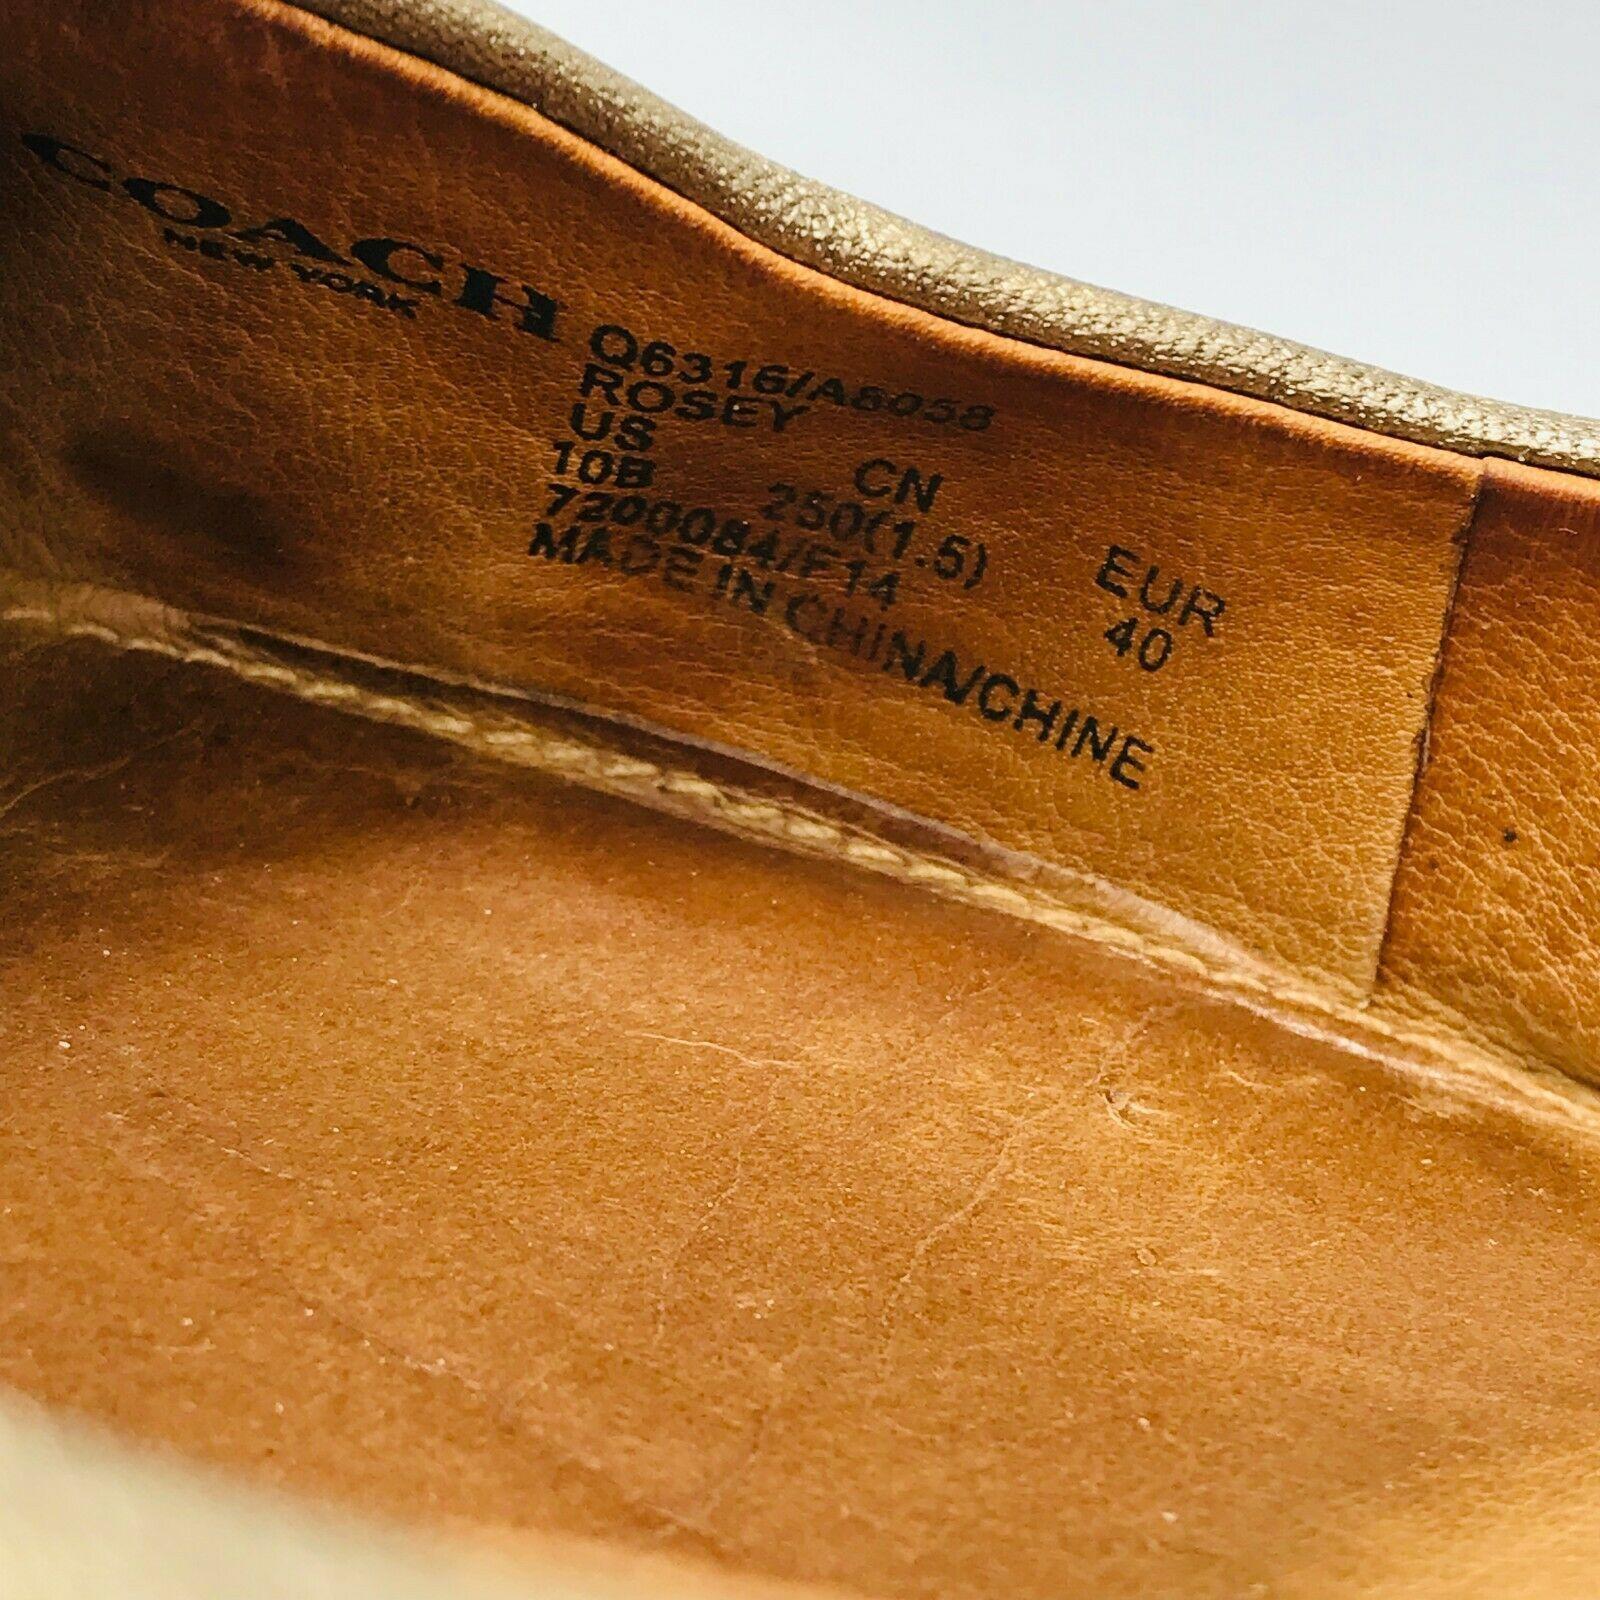 Coach Women's Rosey Pumps Metallic Gold Leather Size 10B